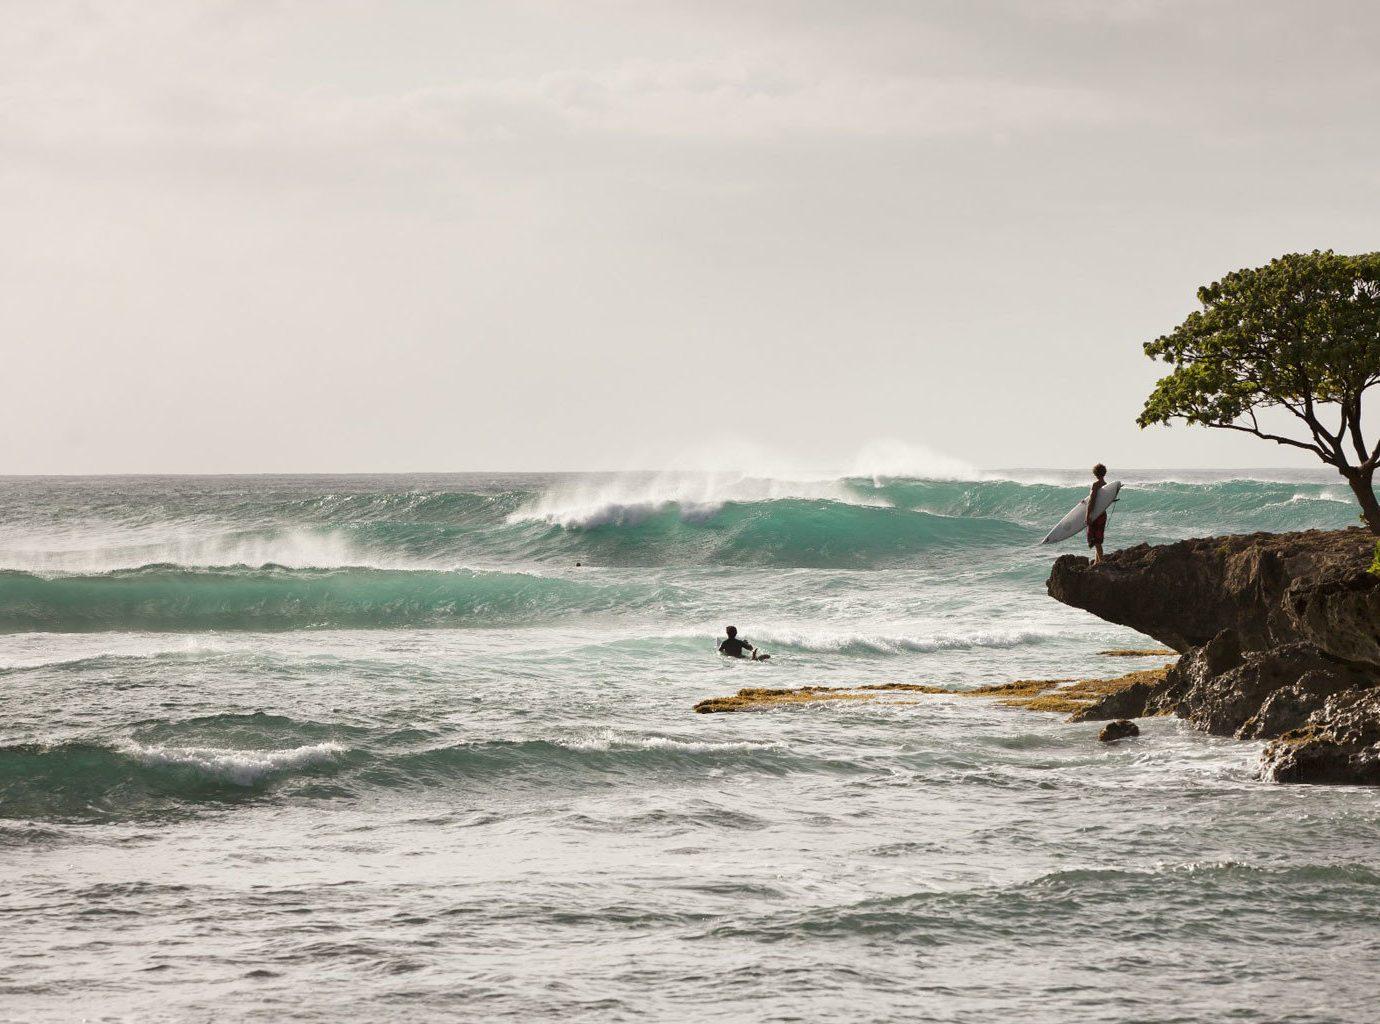 Beach Beachfront Ocean water sky shore Sea wave wind wave Coast water sport surfing surfing equipment and supplies boardsport surfboard cape wind